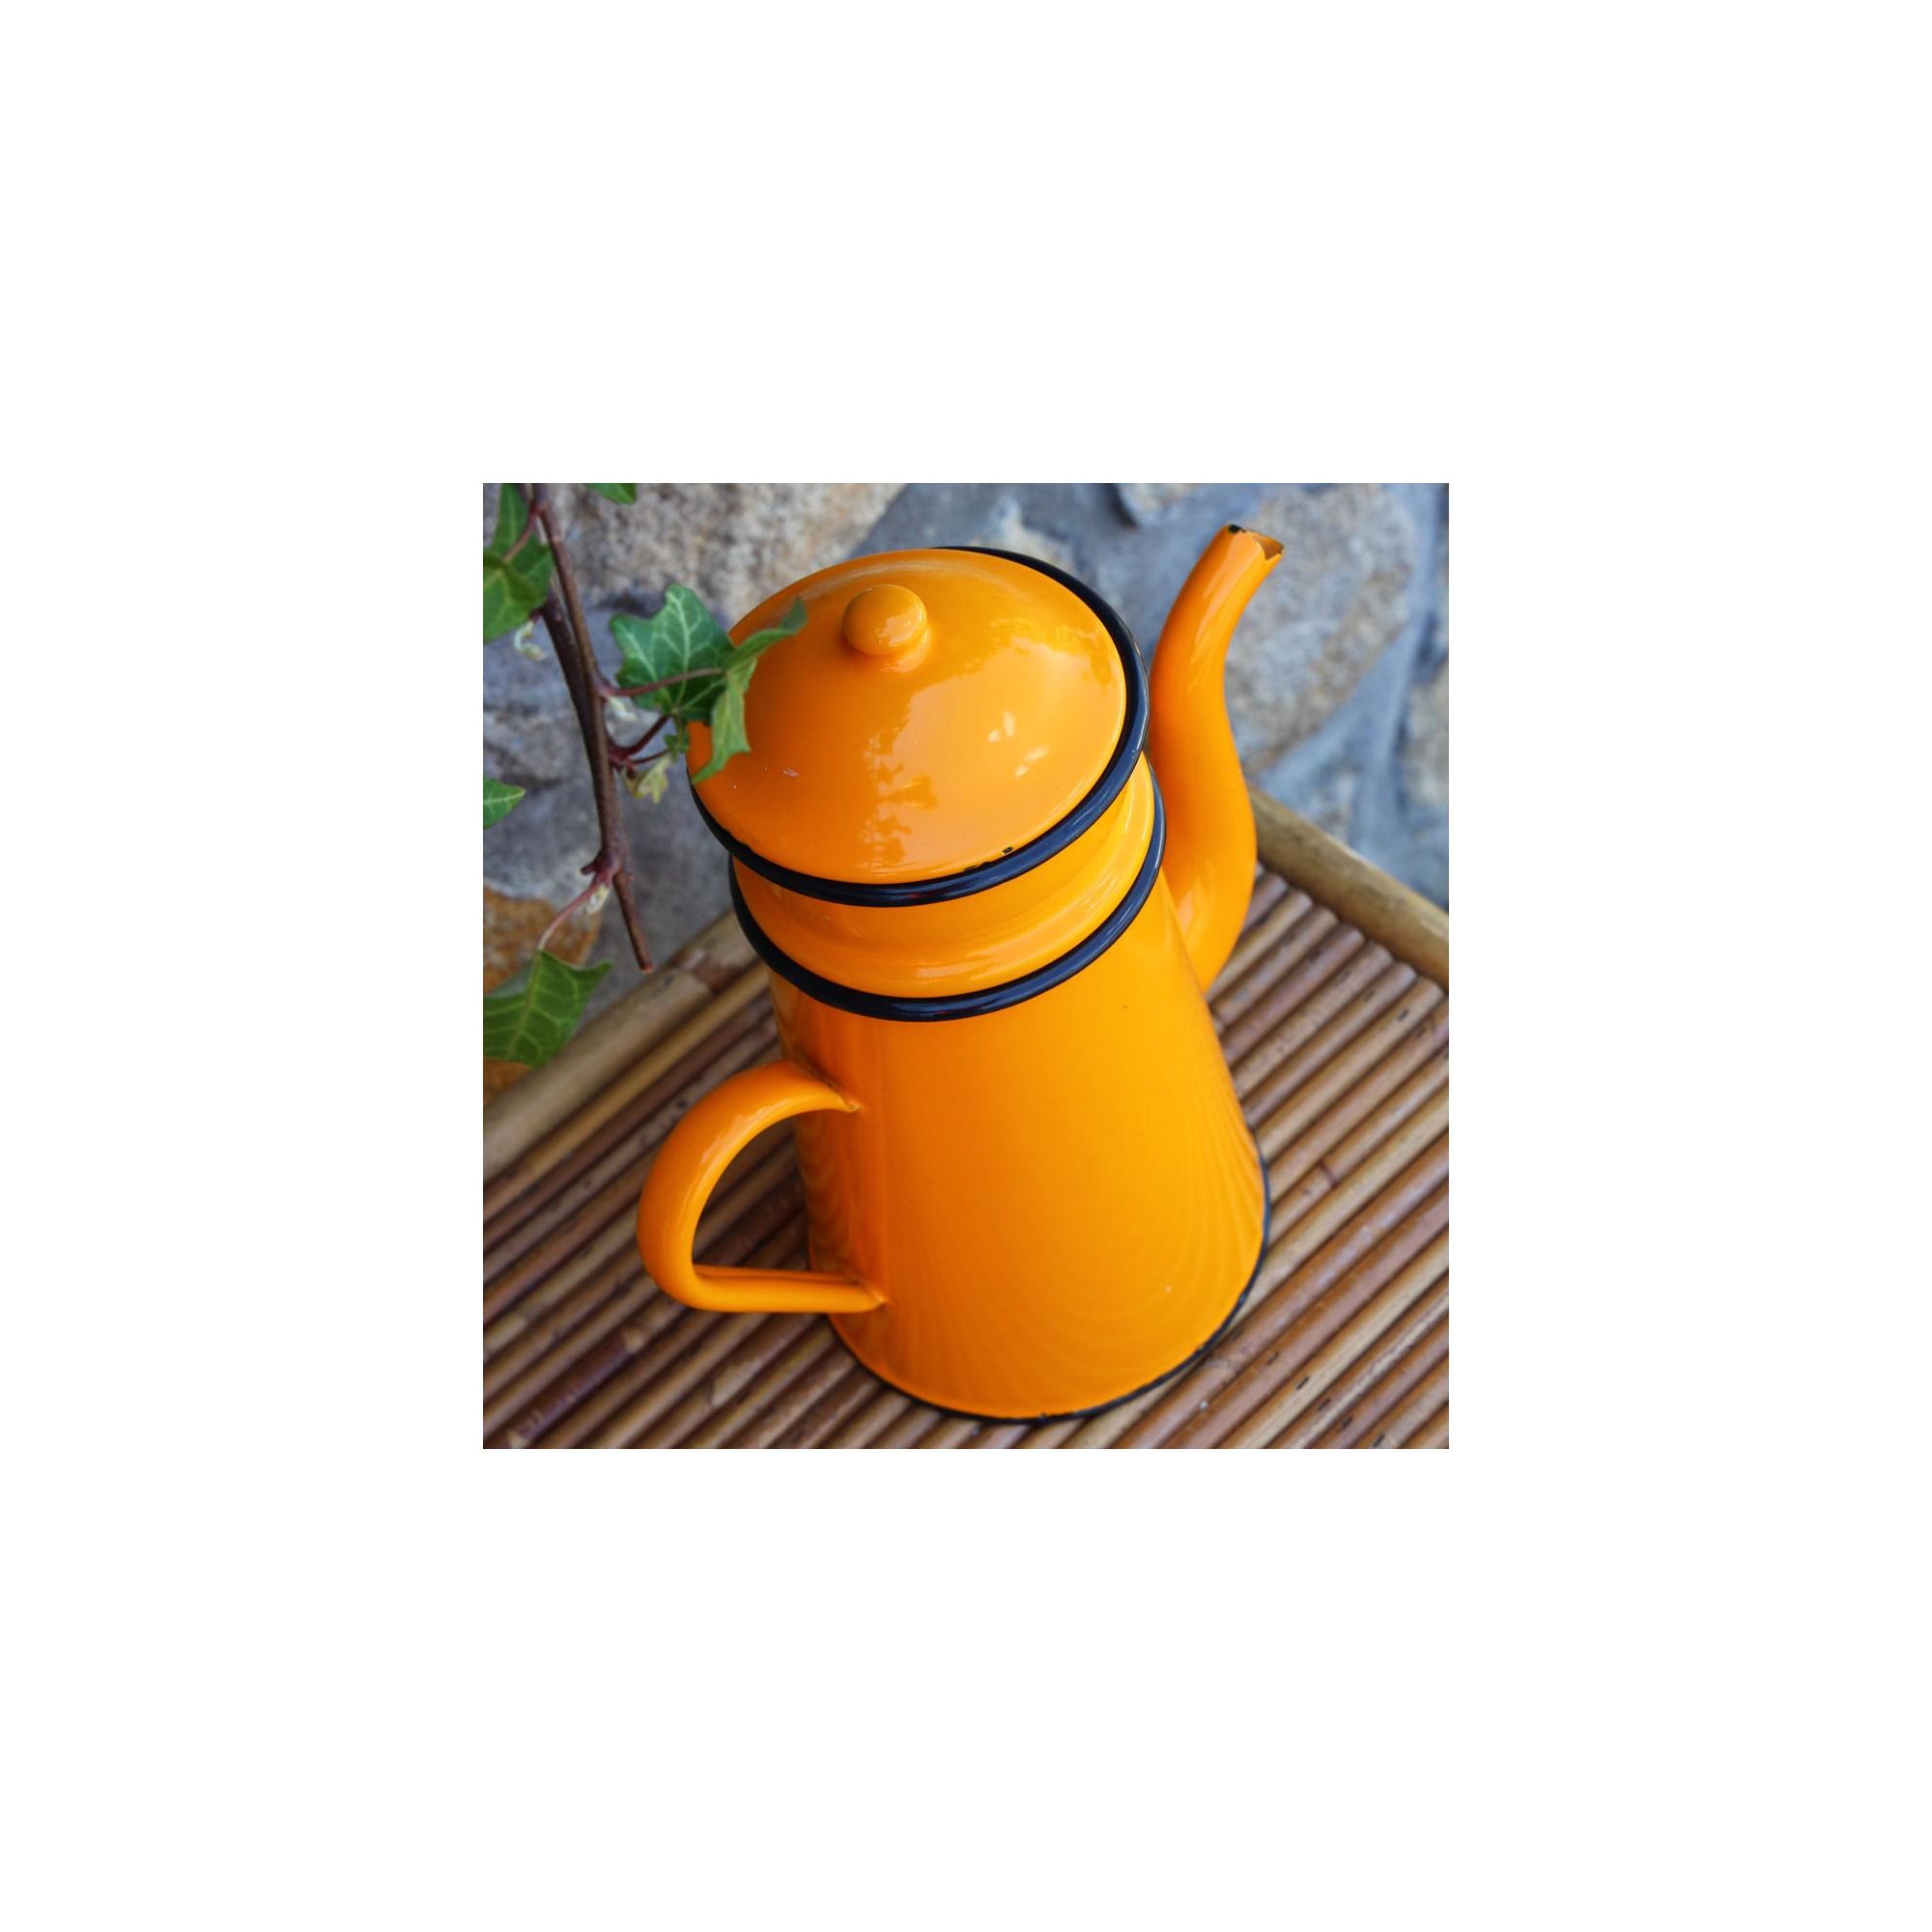 *BROC* Cafetière émaillée vintage orange, 25 cm (H). Loading zoom